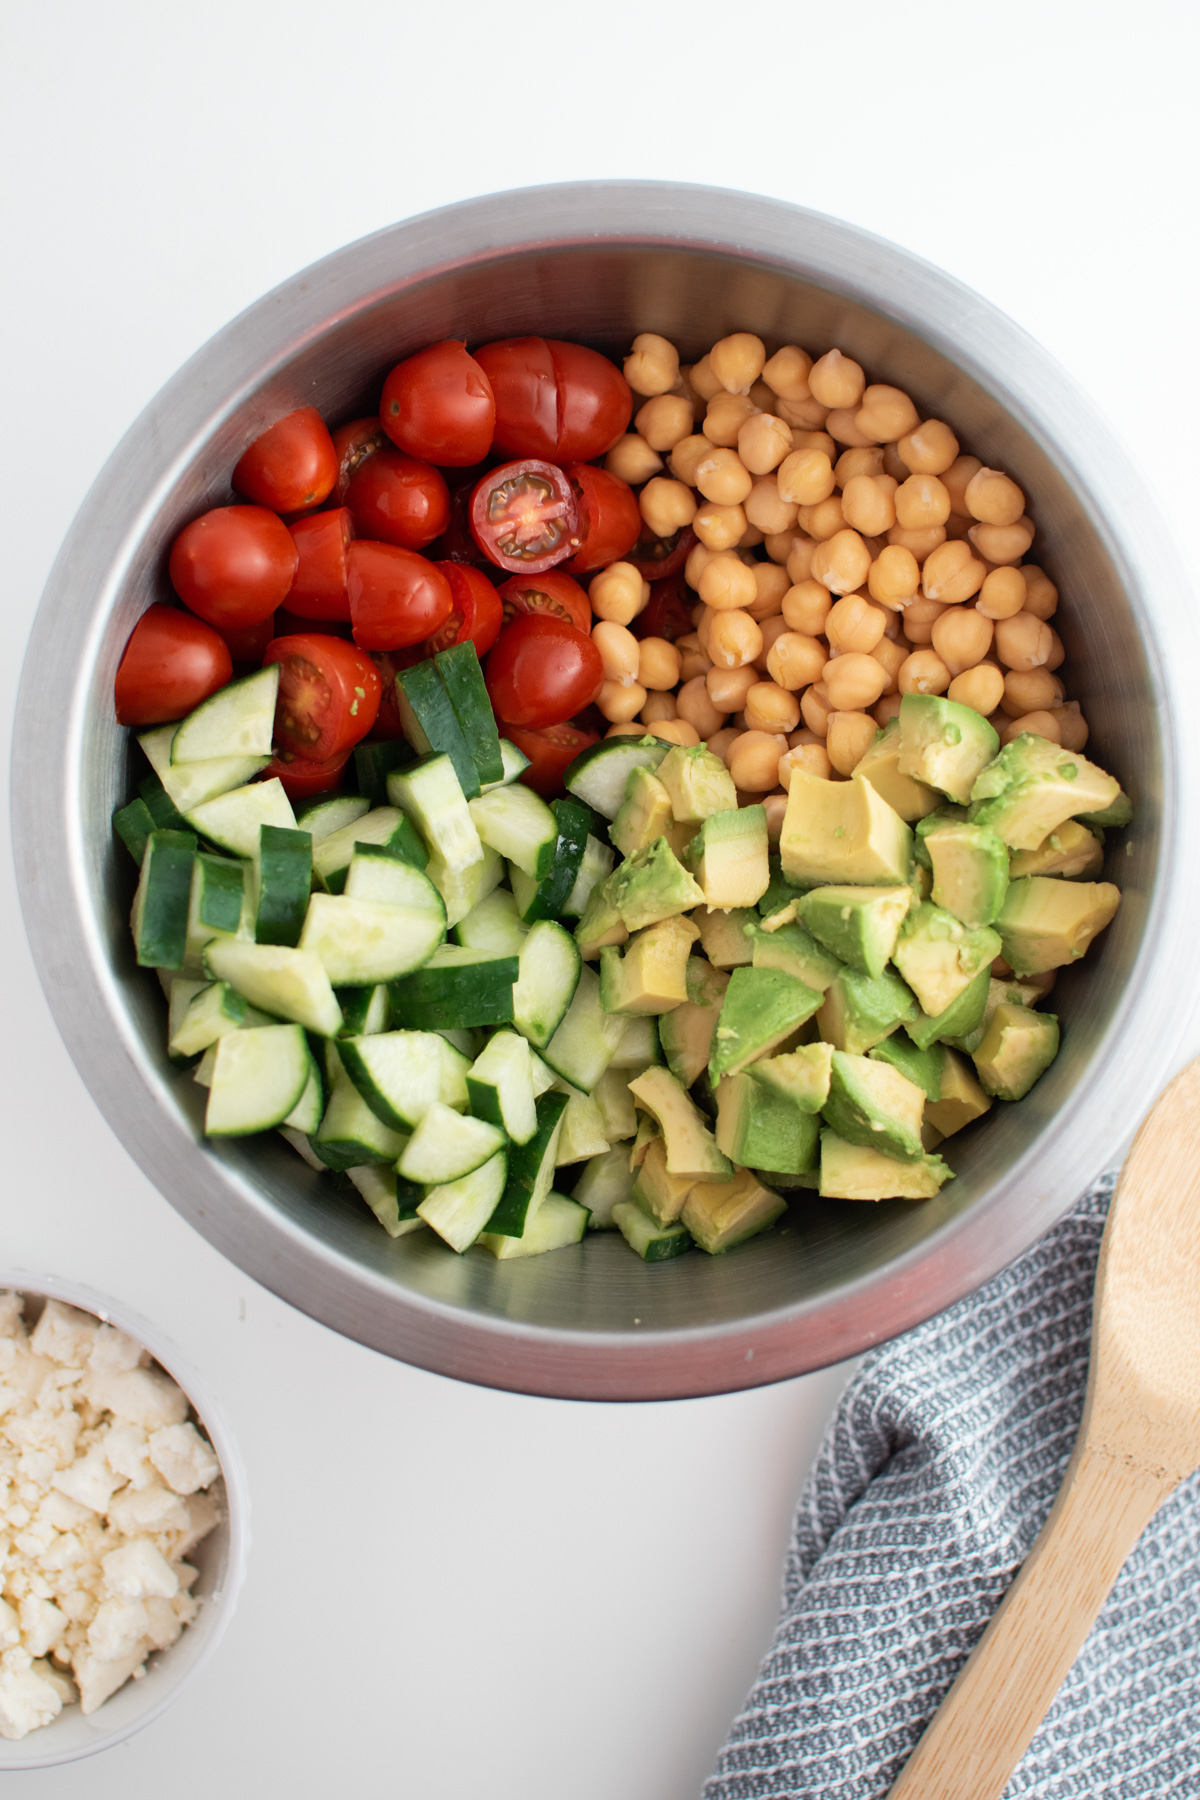 Cilantro chickpea salad ingredients in large metal mixing bowl next to bowl of feta.